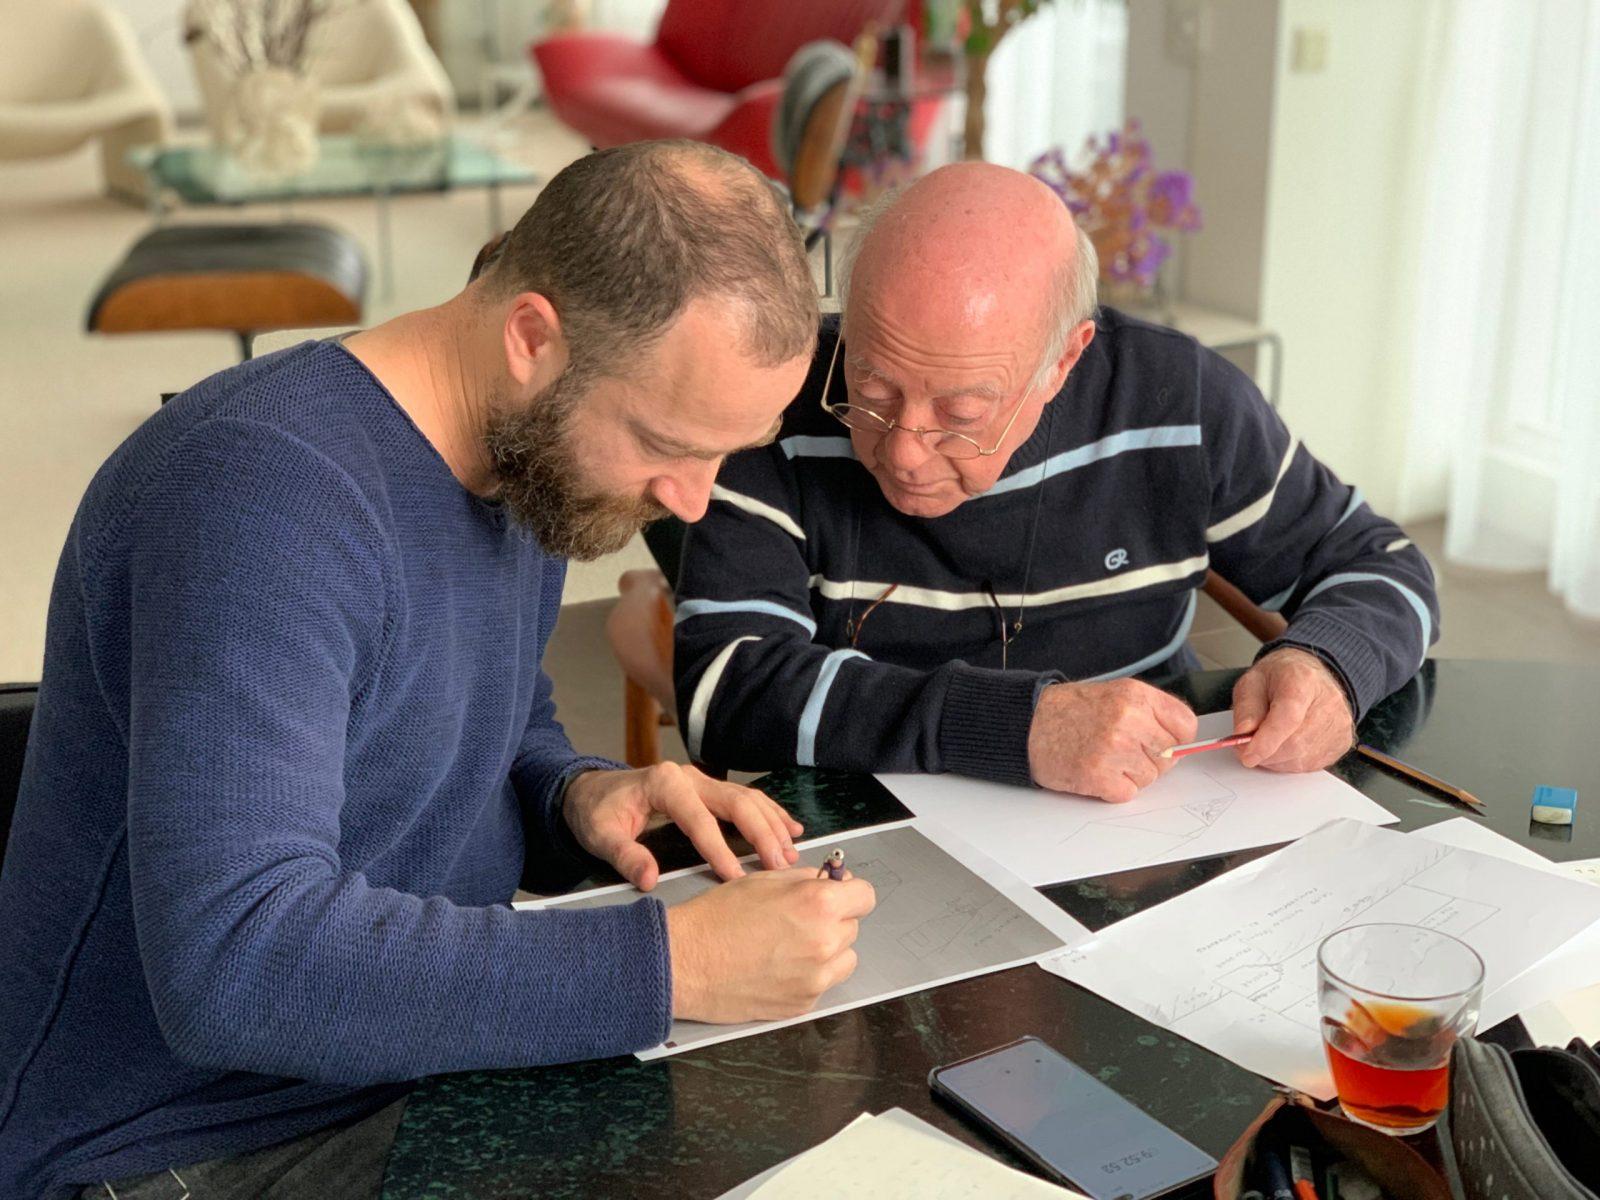 Gilad Seliktar & Rolf Kamp (Amsterdam, December 2019)